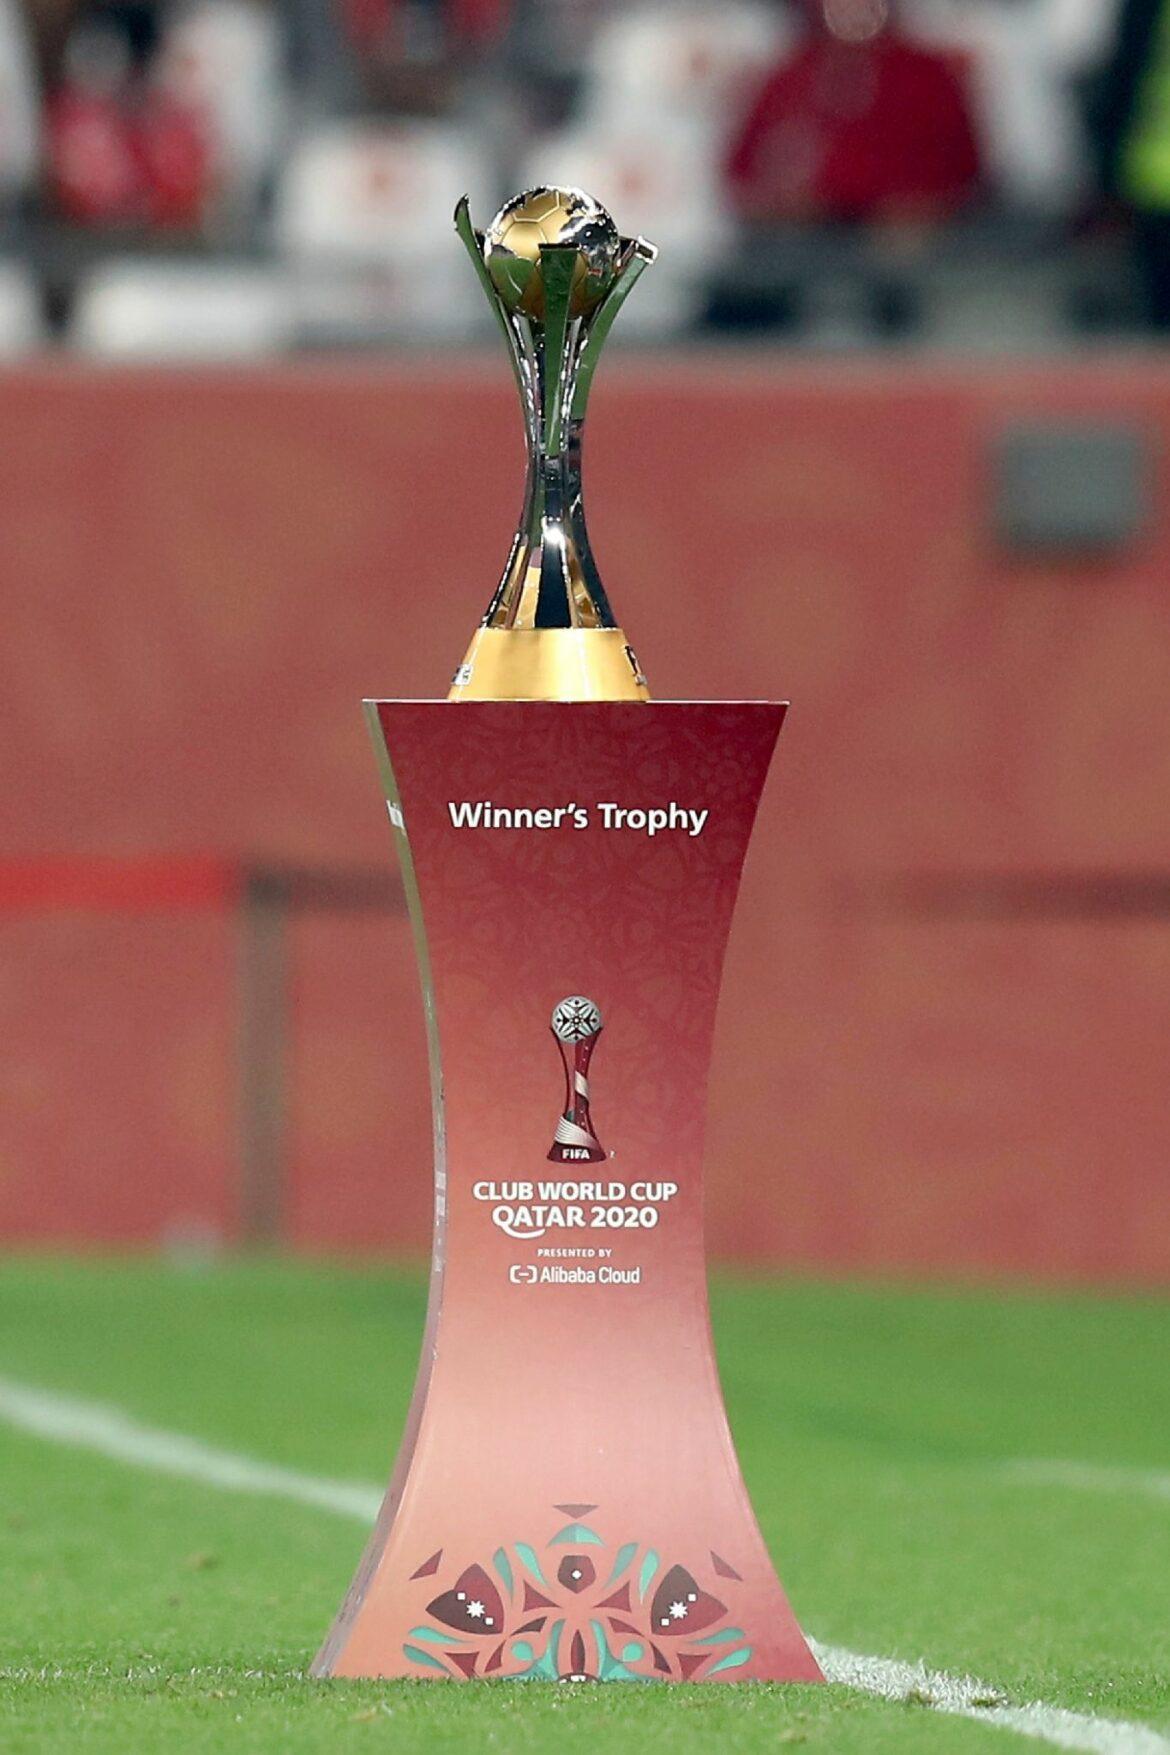 Club-WM Anfang 2022 in den Emiraten statt in Japan